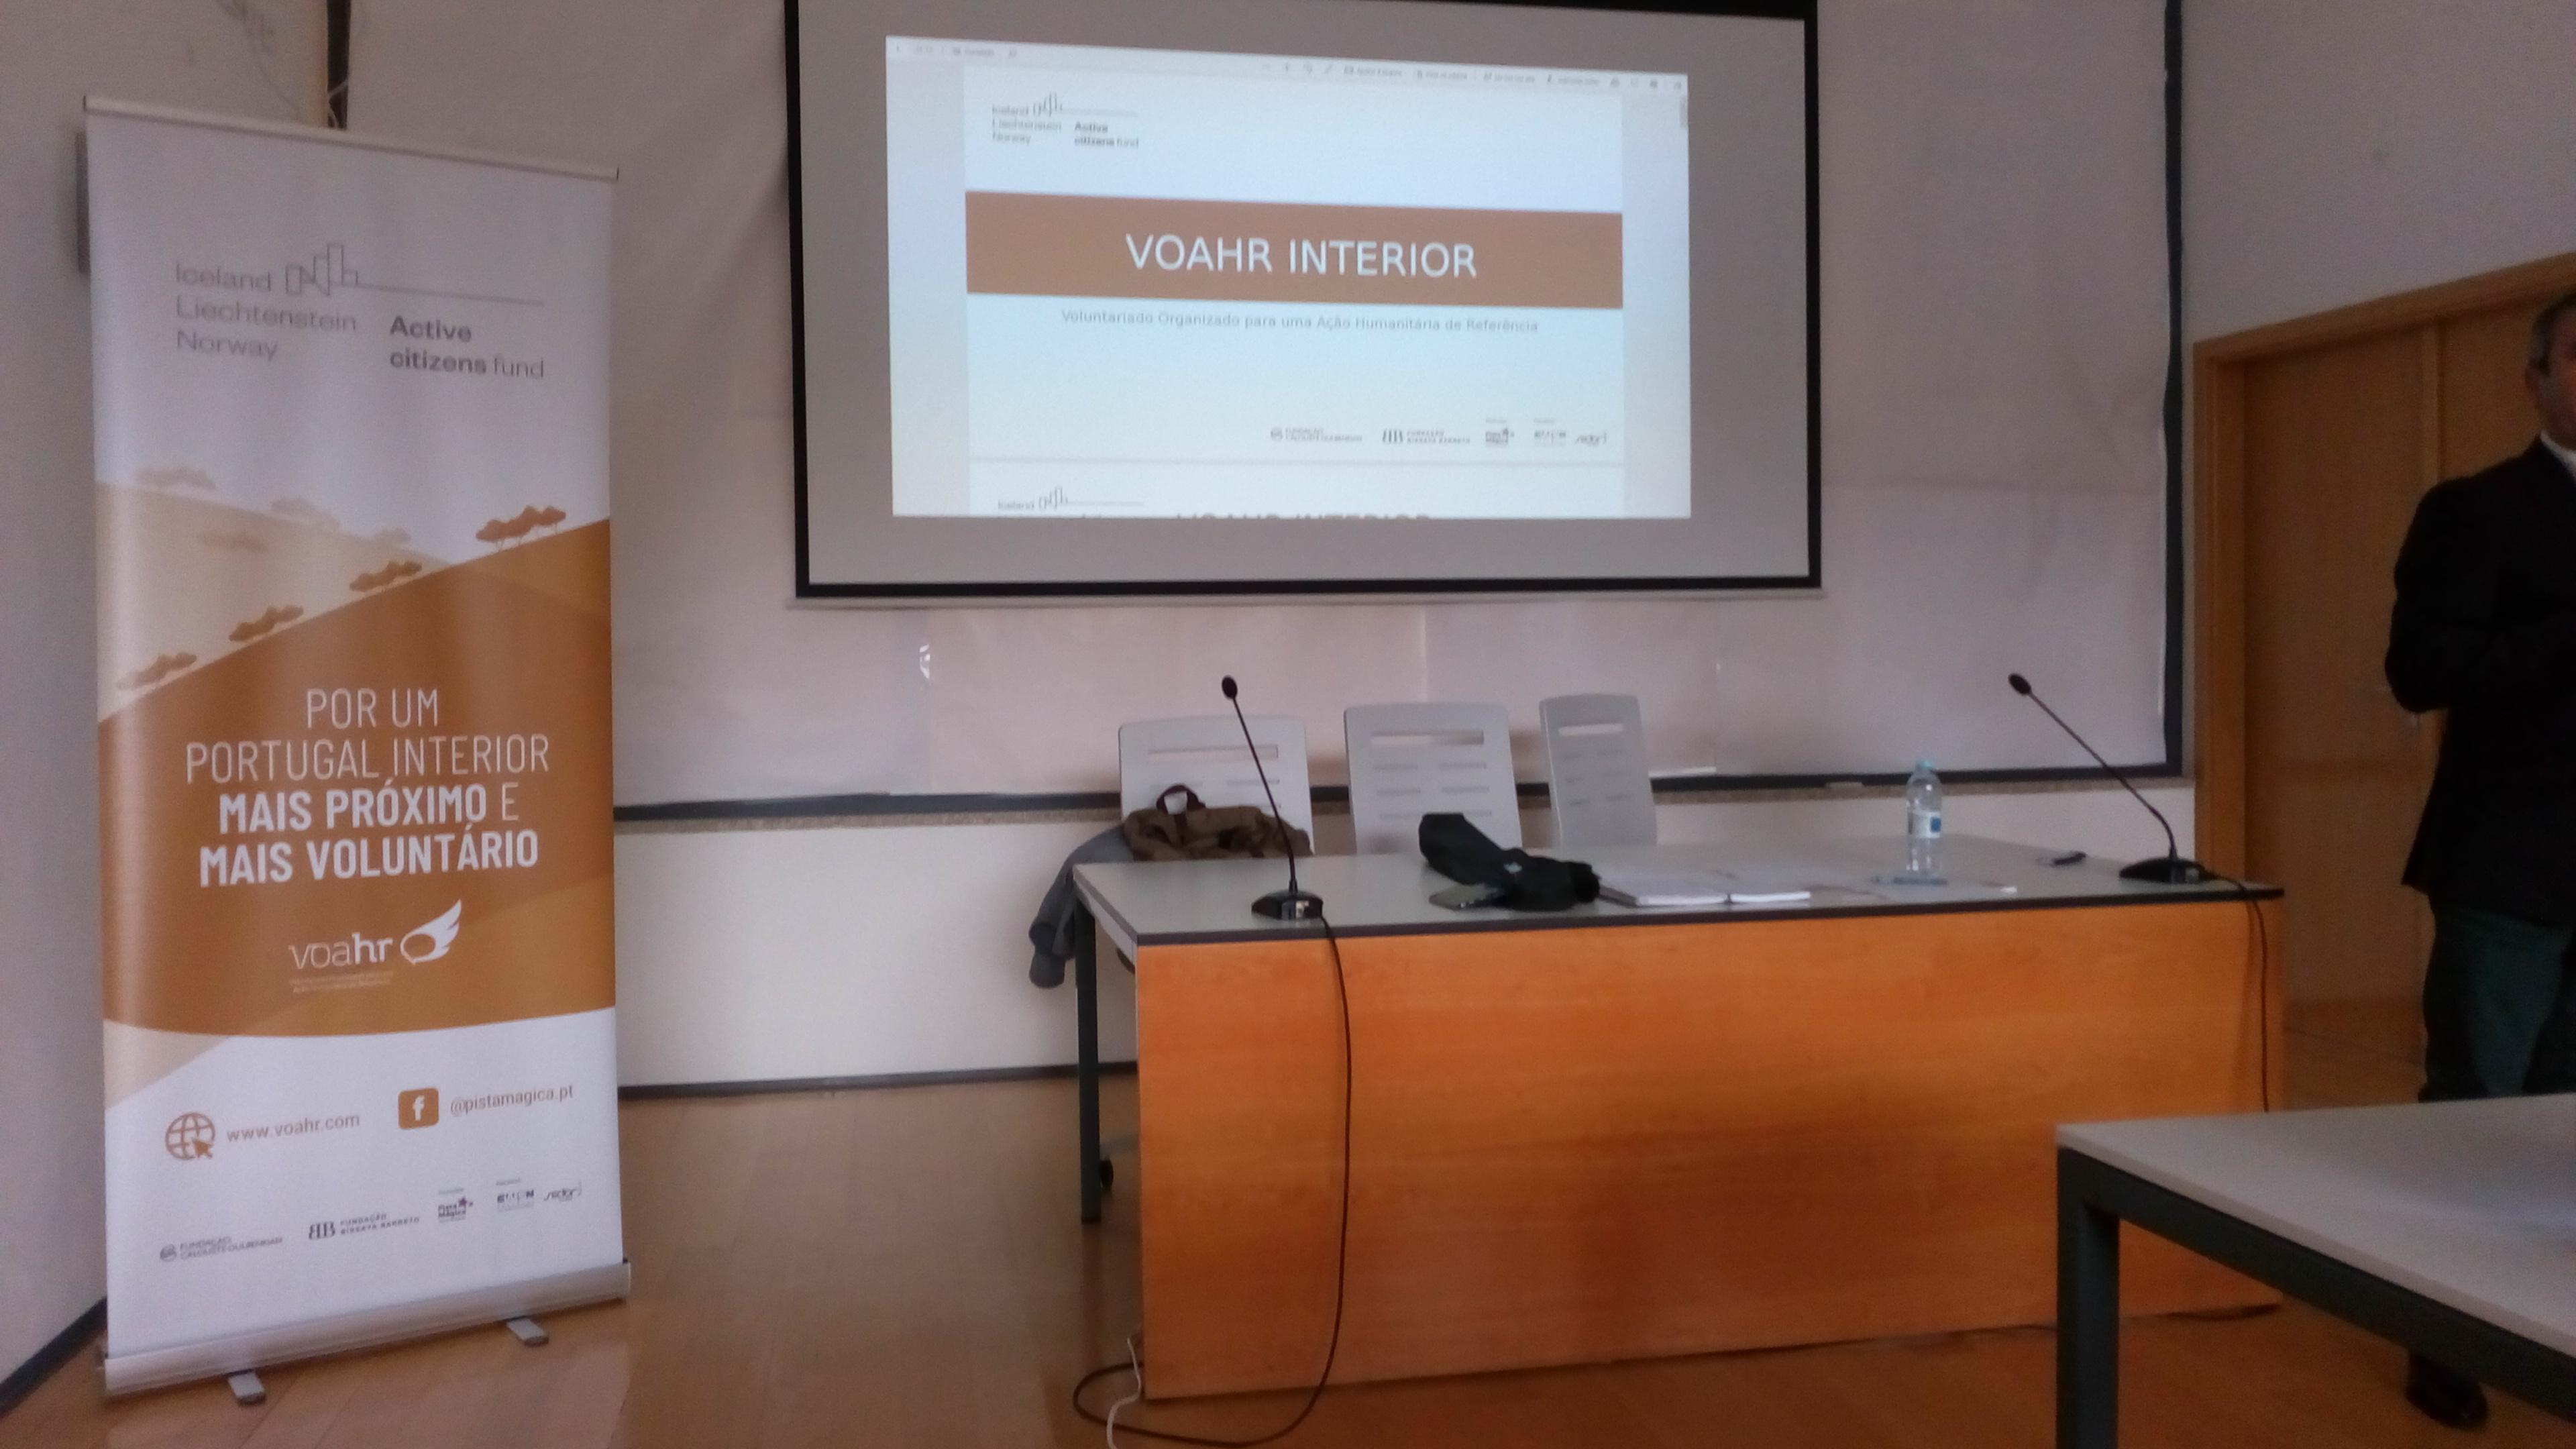 Projeto VOAHR Interior